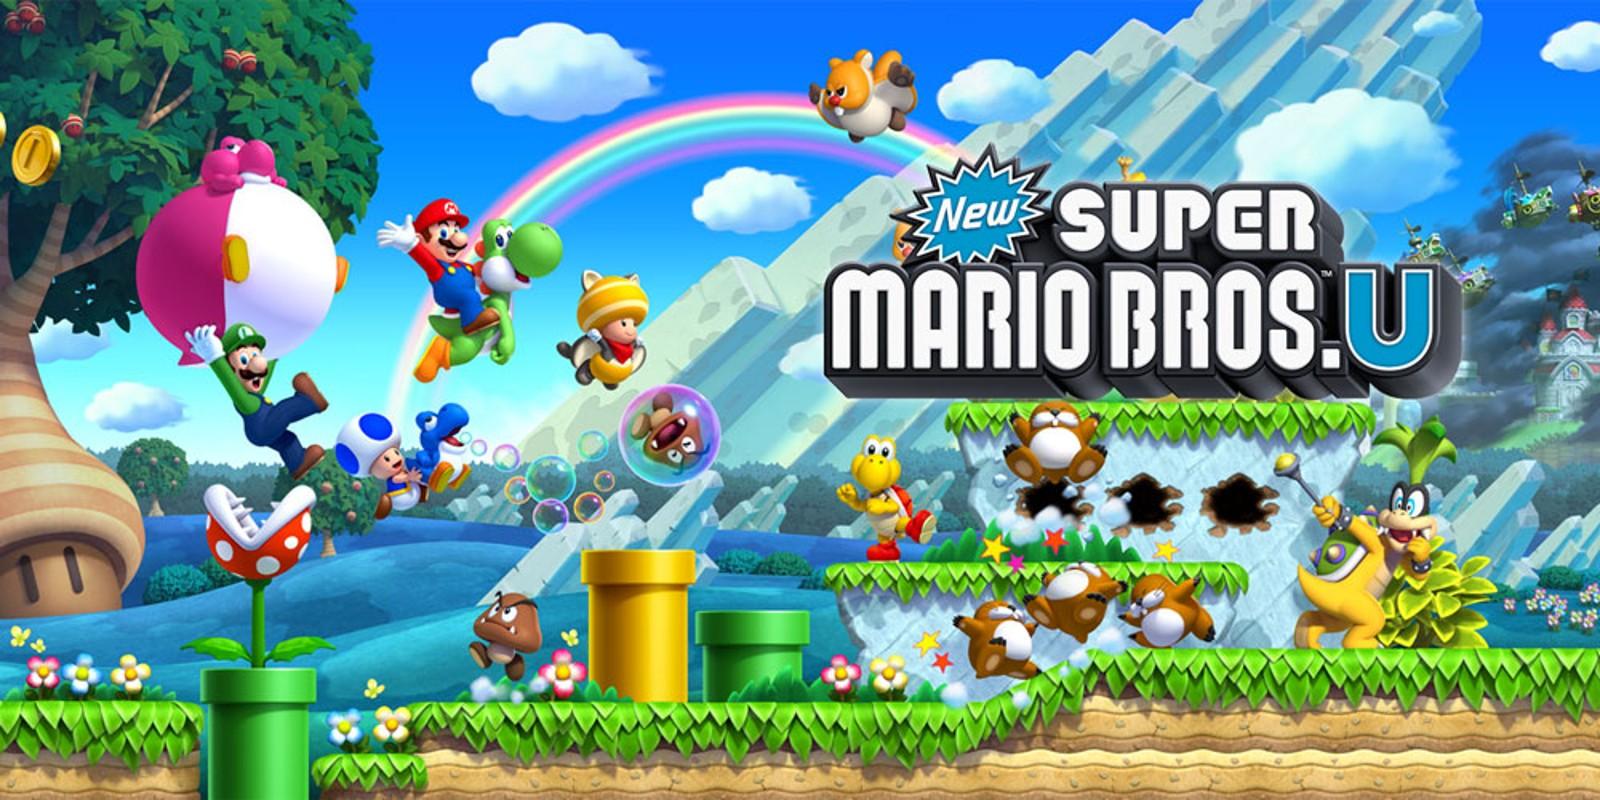 New Super Mario Bros. U Deluxe arriva su Nintendo Switch